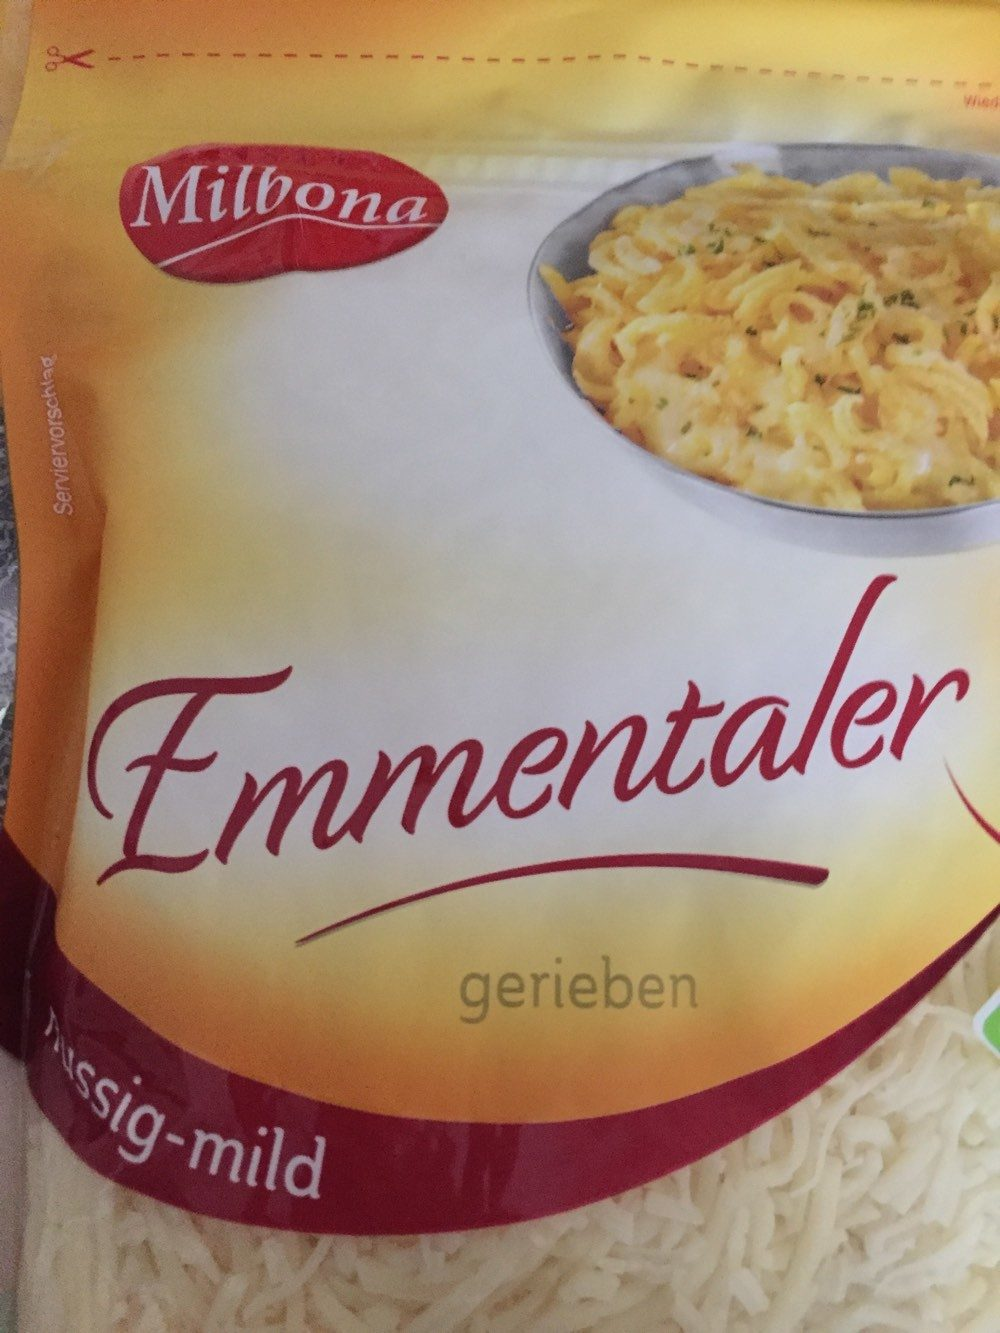 Emmentaler gerieben - Produkt